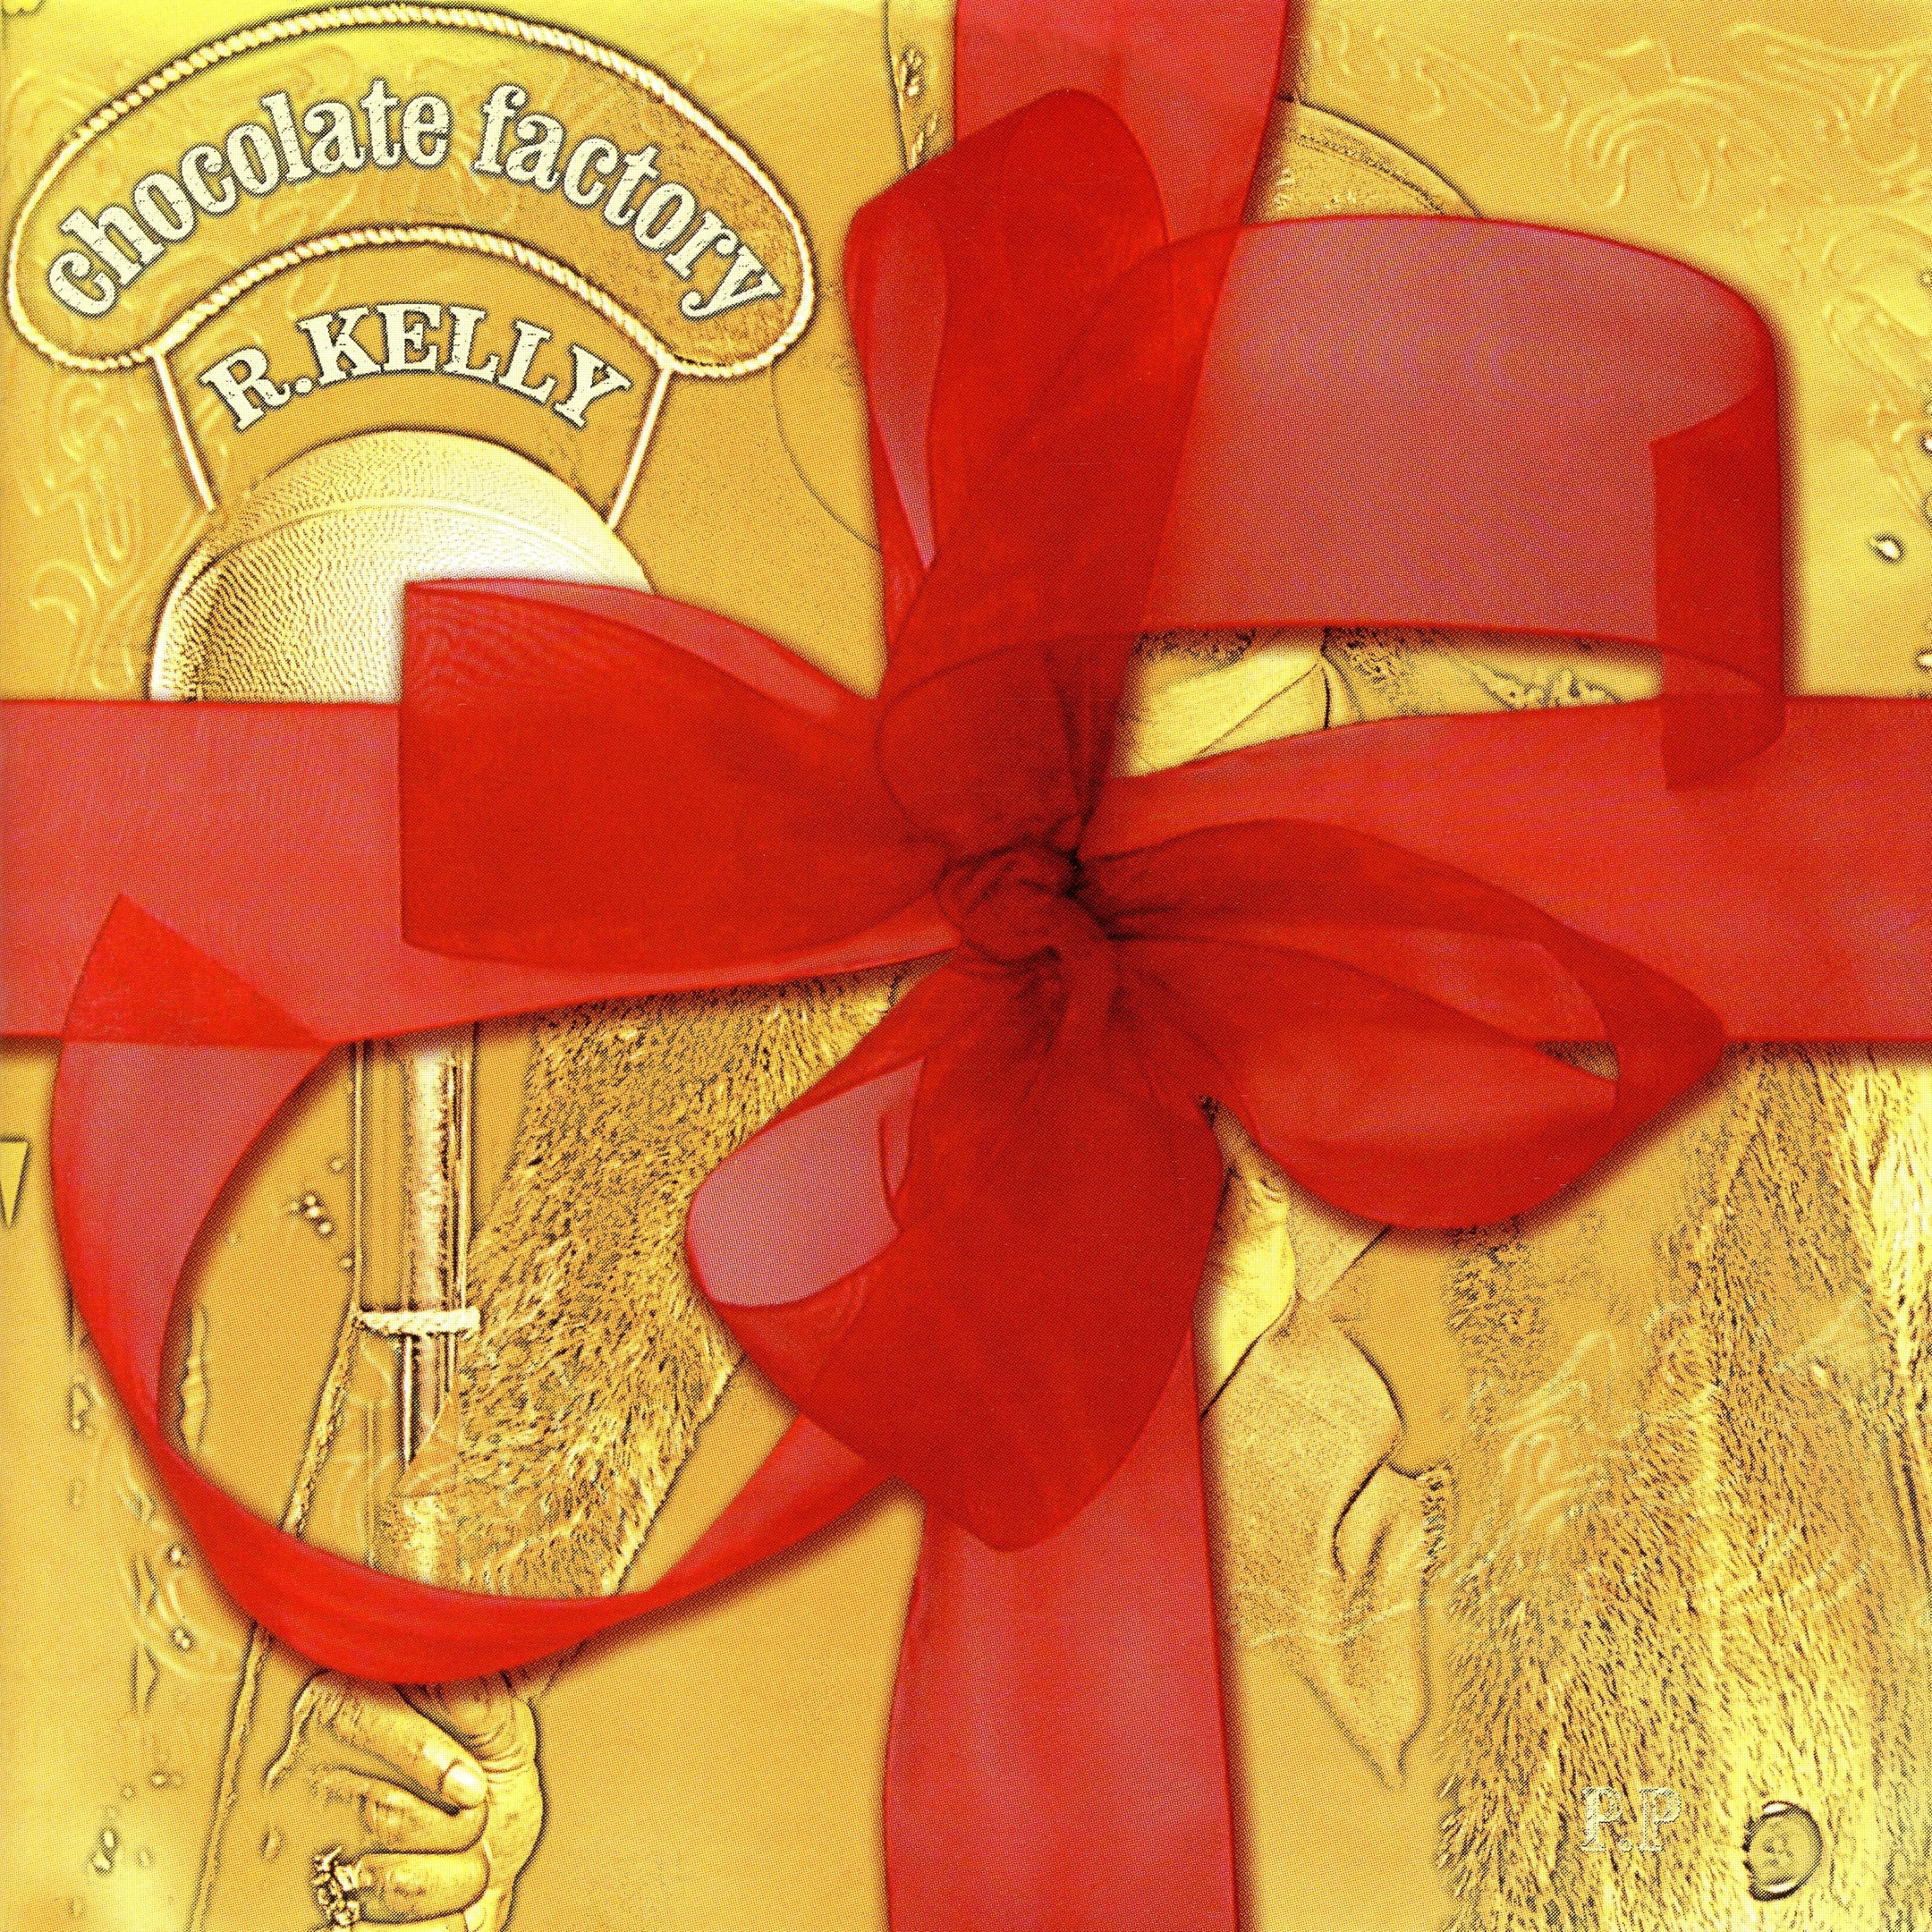 R. Kelly album Chocolate Factory